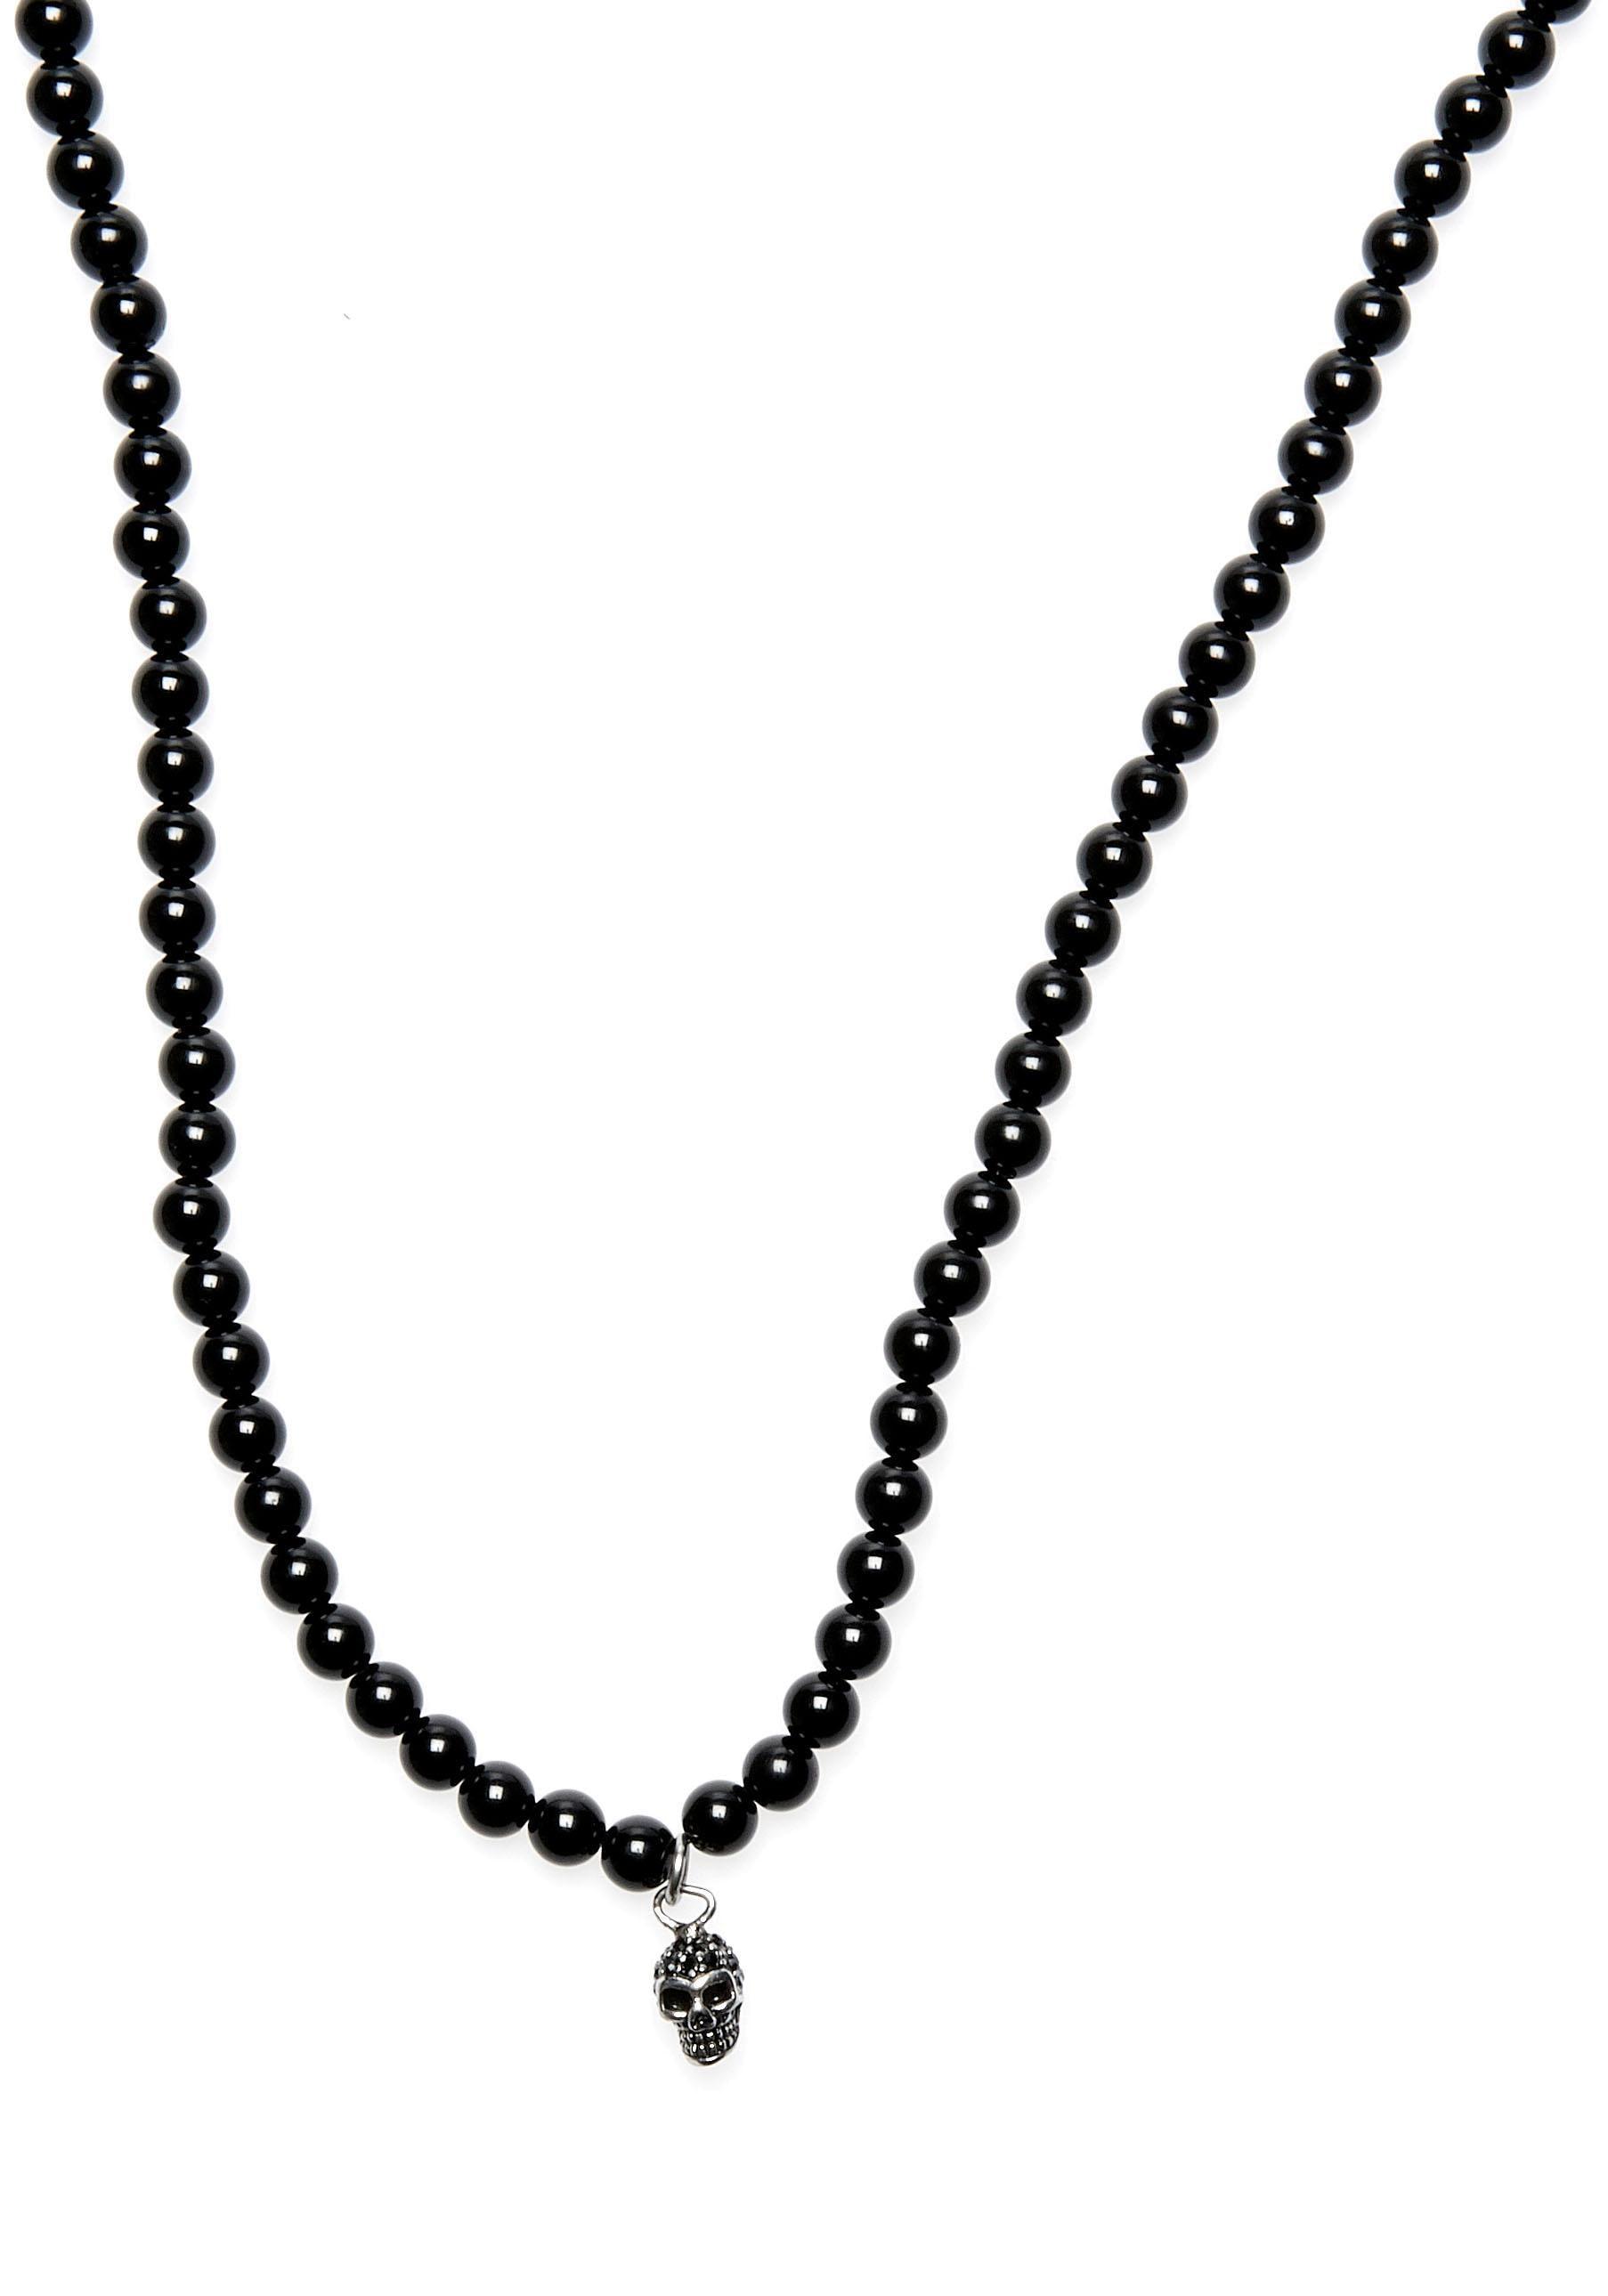 ROYAL EGO Kette mit Anhänger Skull Lava Beads silver jet 1712 | Schmuck > Halsketten | Schwarz | Royal Ego